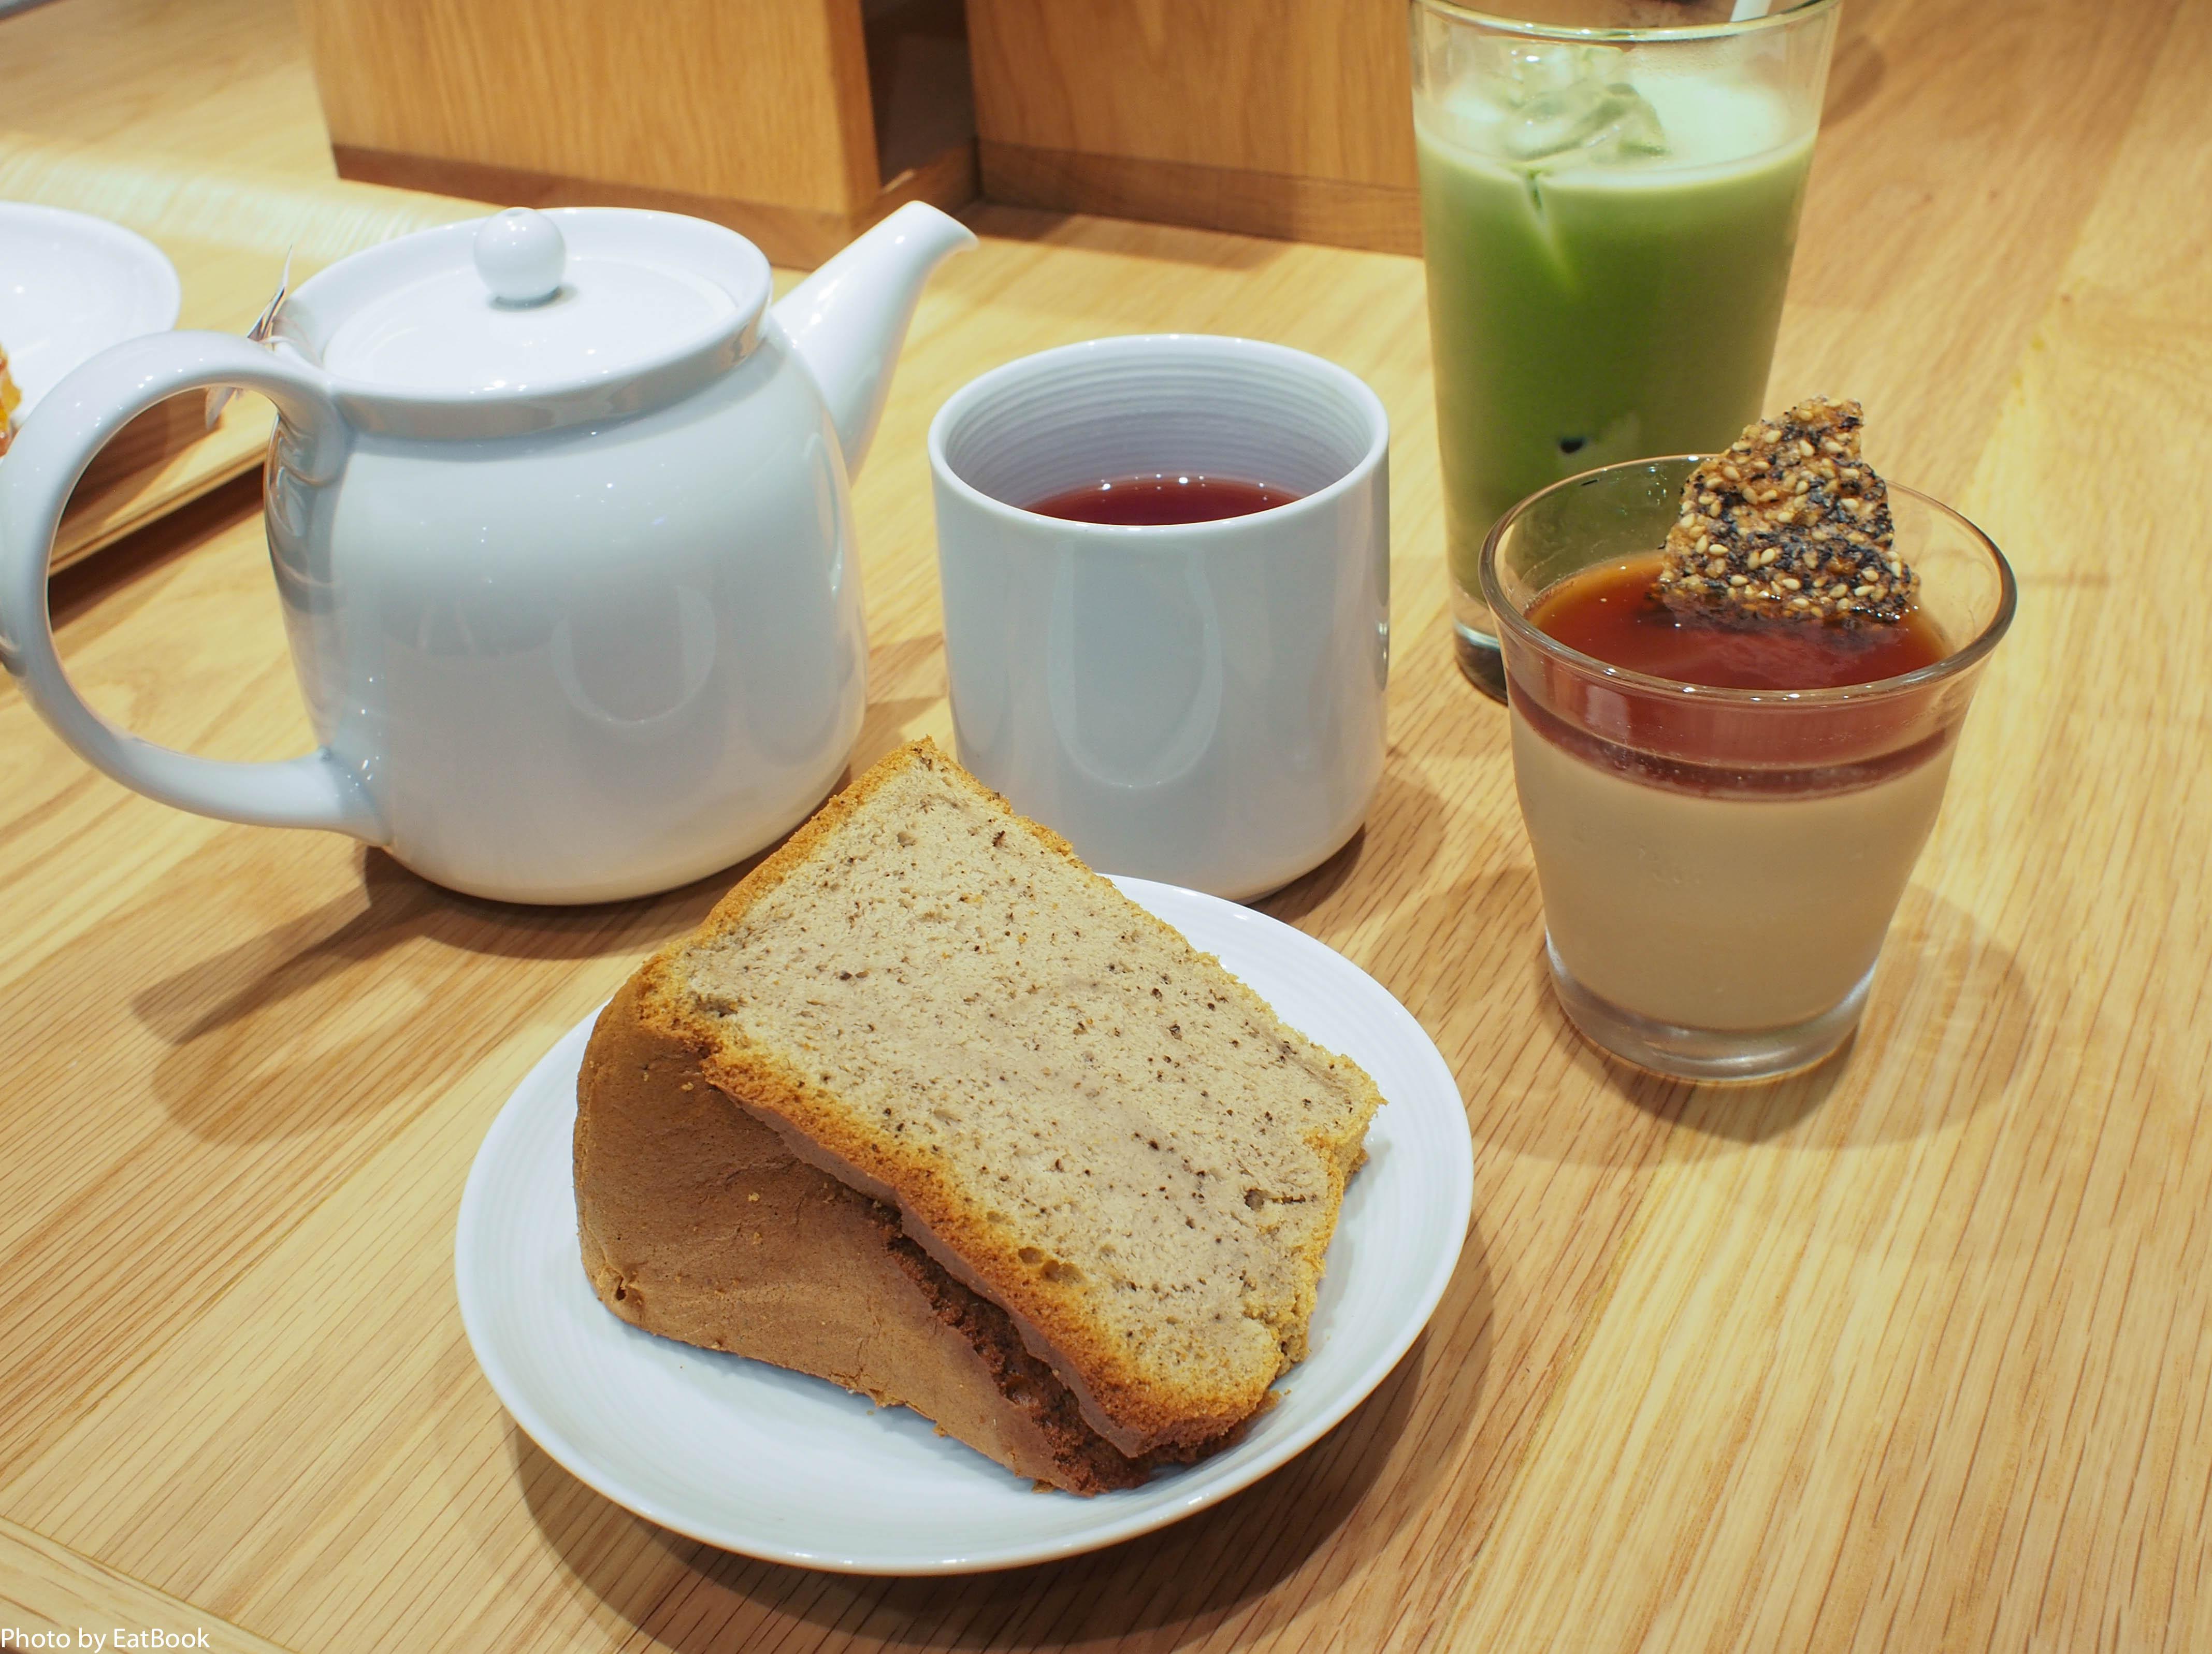 Café & Meal MUJI Review Bringing Trademark Minimalism to Dining